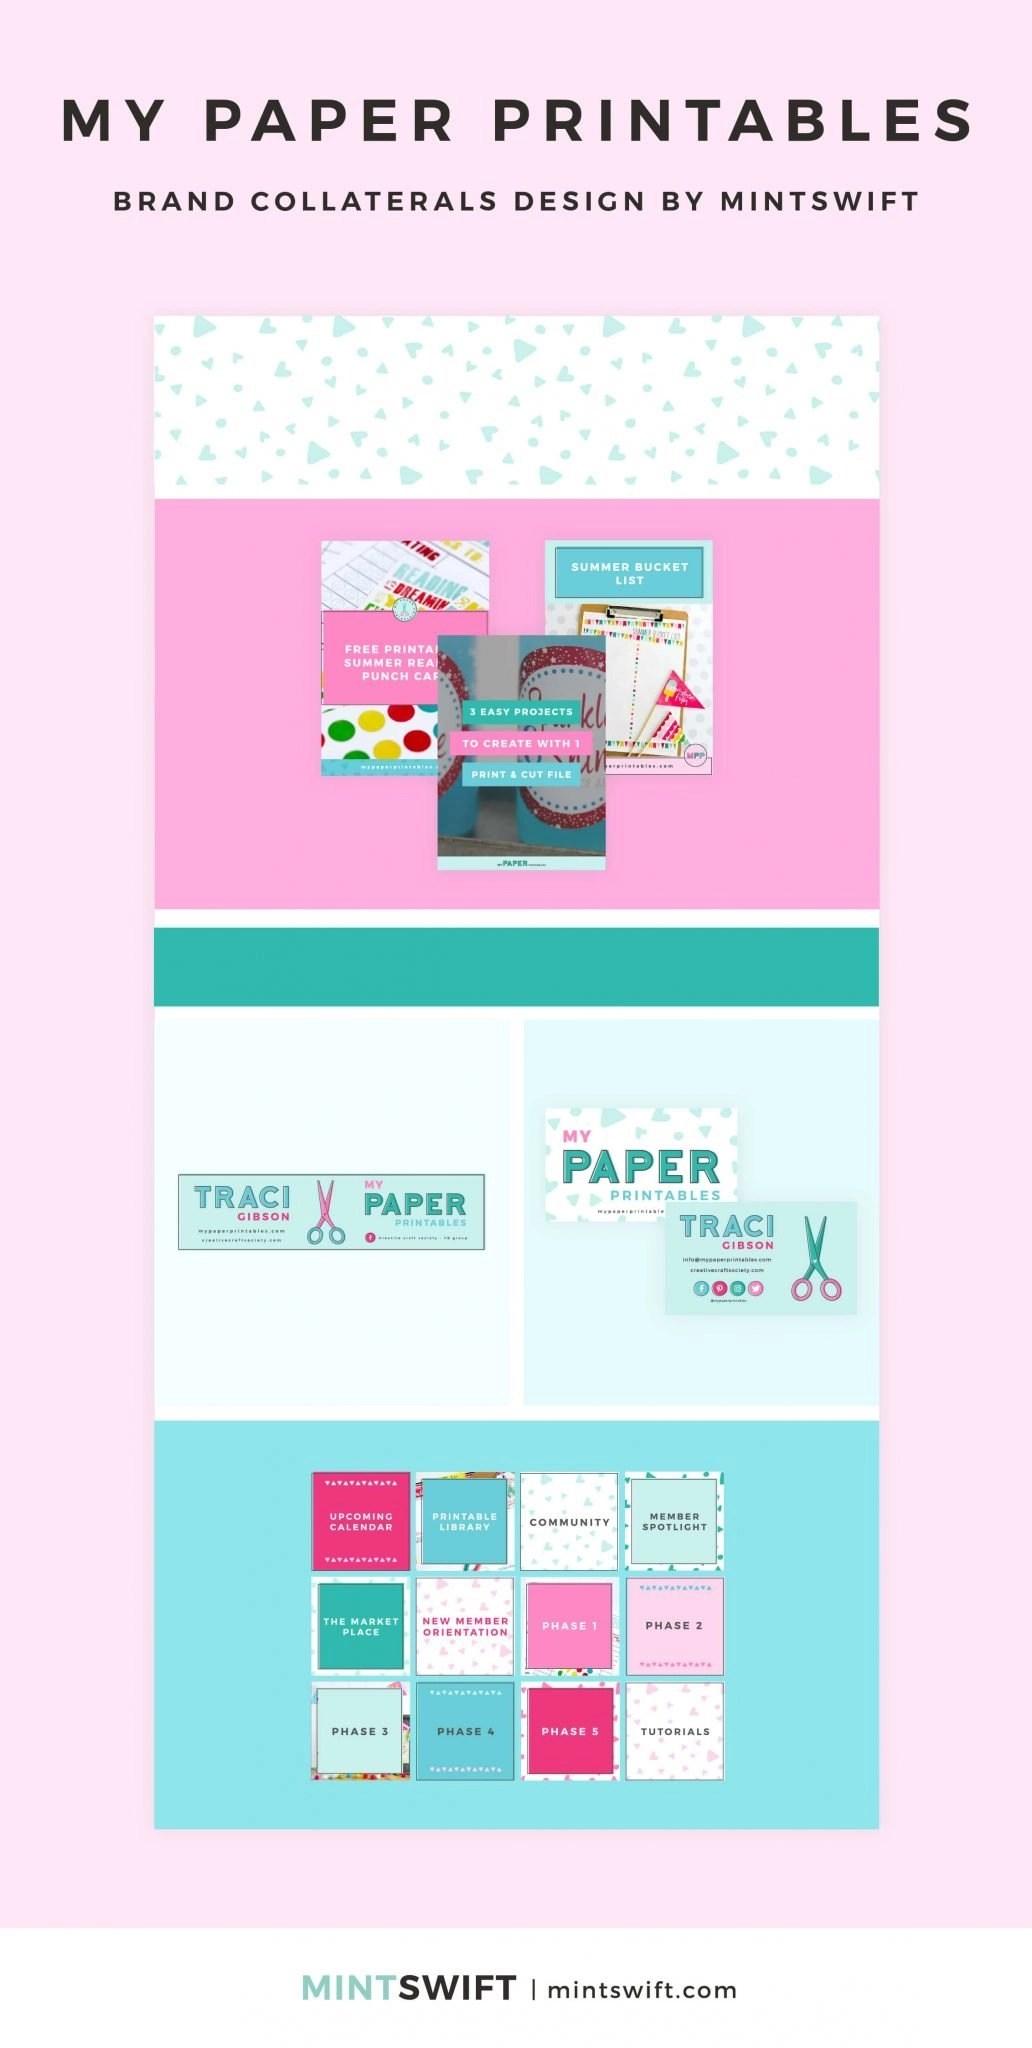 My Paper Printables - Brand Collaterals Design - MintSwift - Adrianna Leszczynska